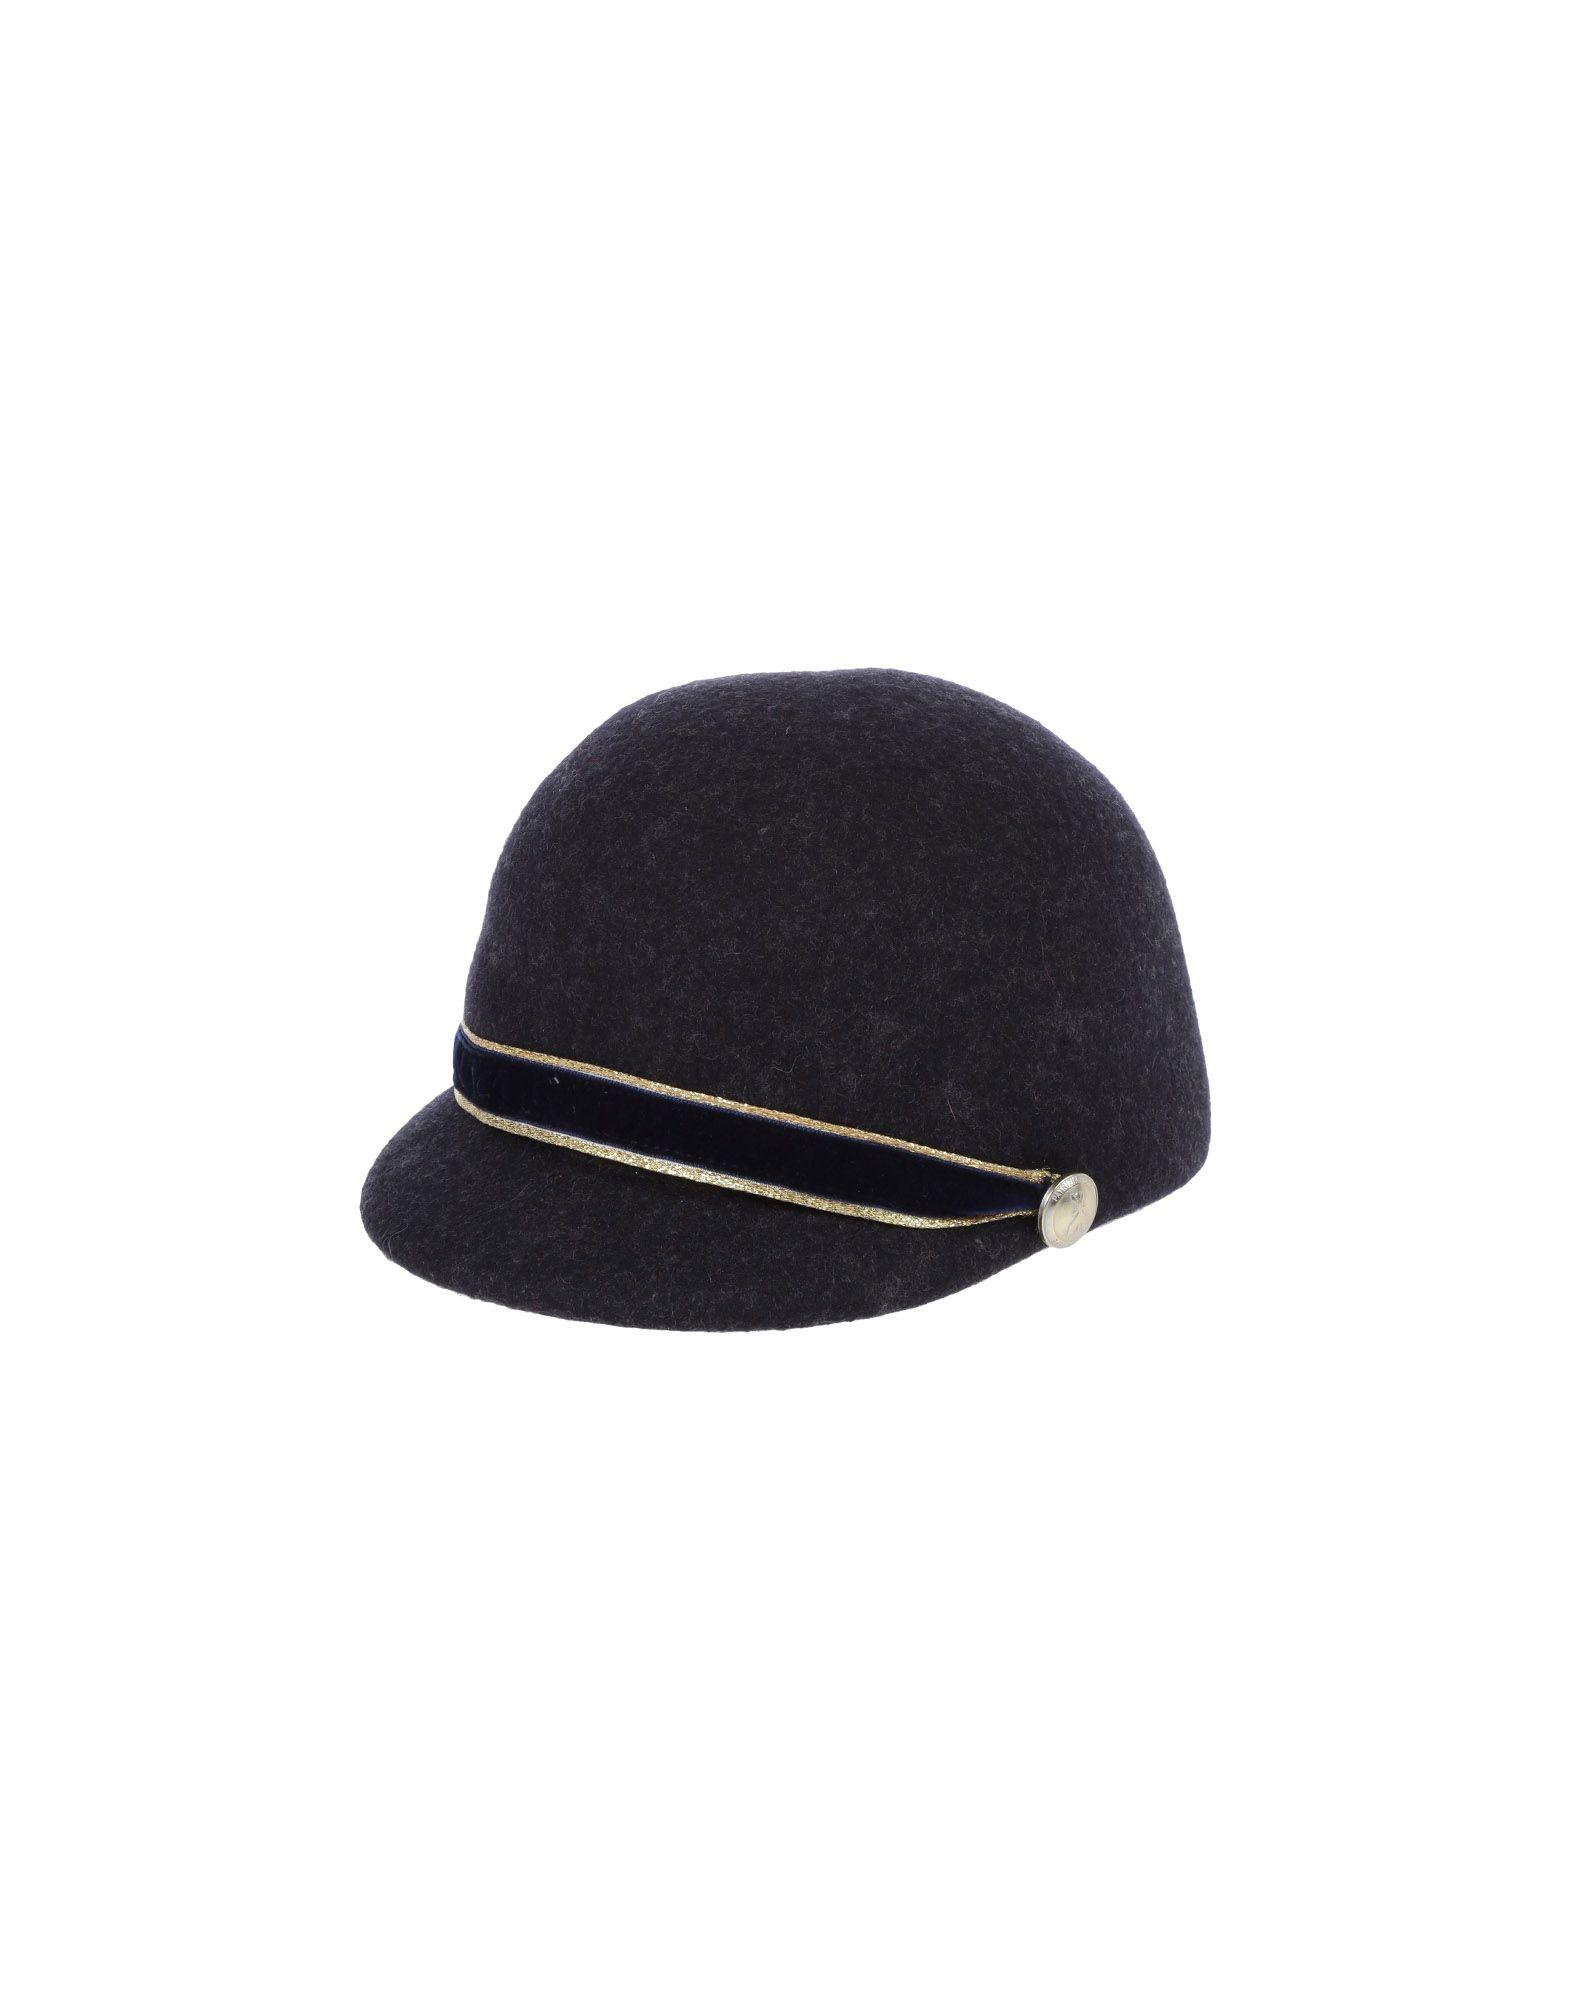 Patrizia Pepe Hats In Steel Grey  b752777ca81